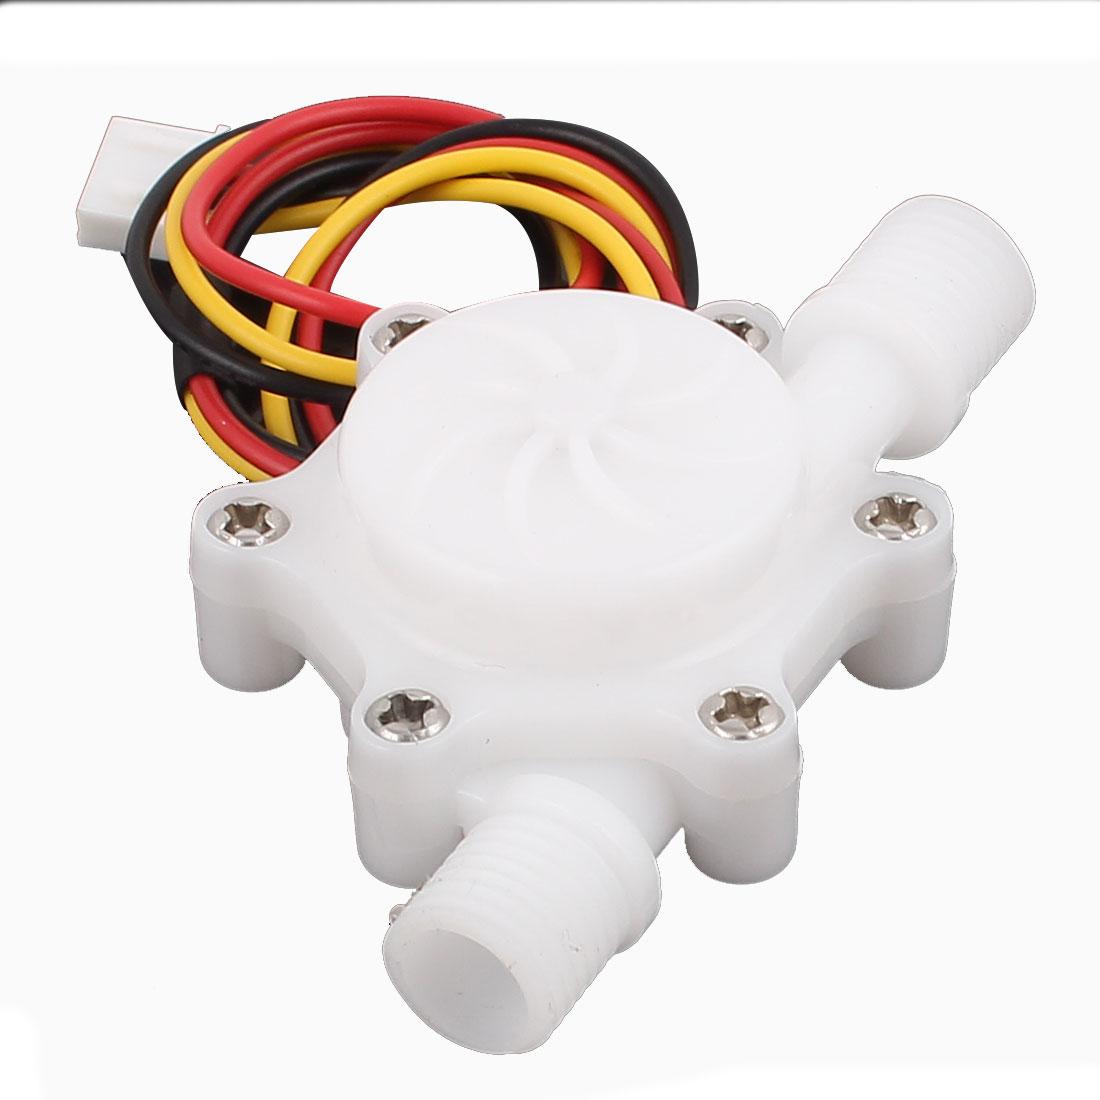 High Precision 0.15-1.5L/min G1/4 Inlet Outlet Thread Water Flow Sensor SEN-HZ06W